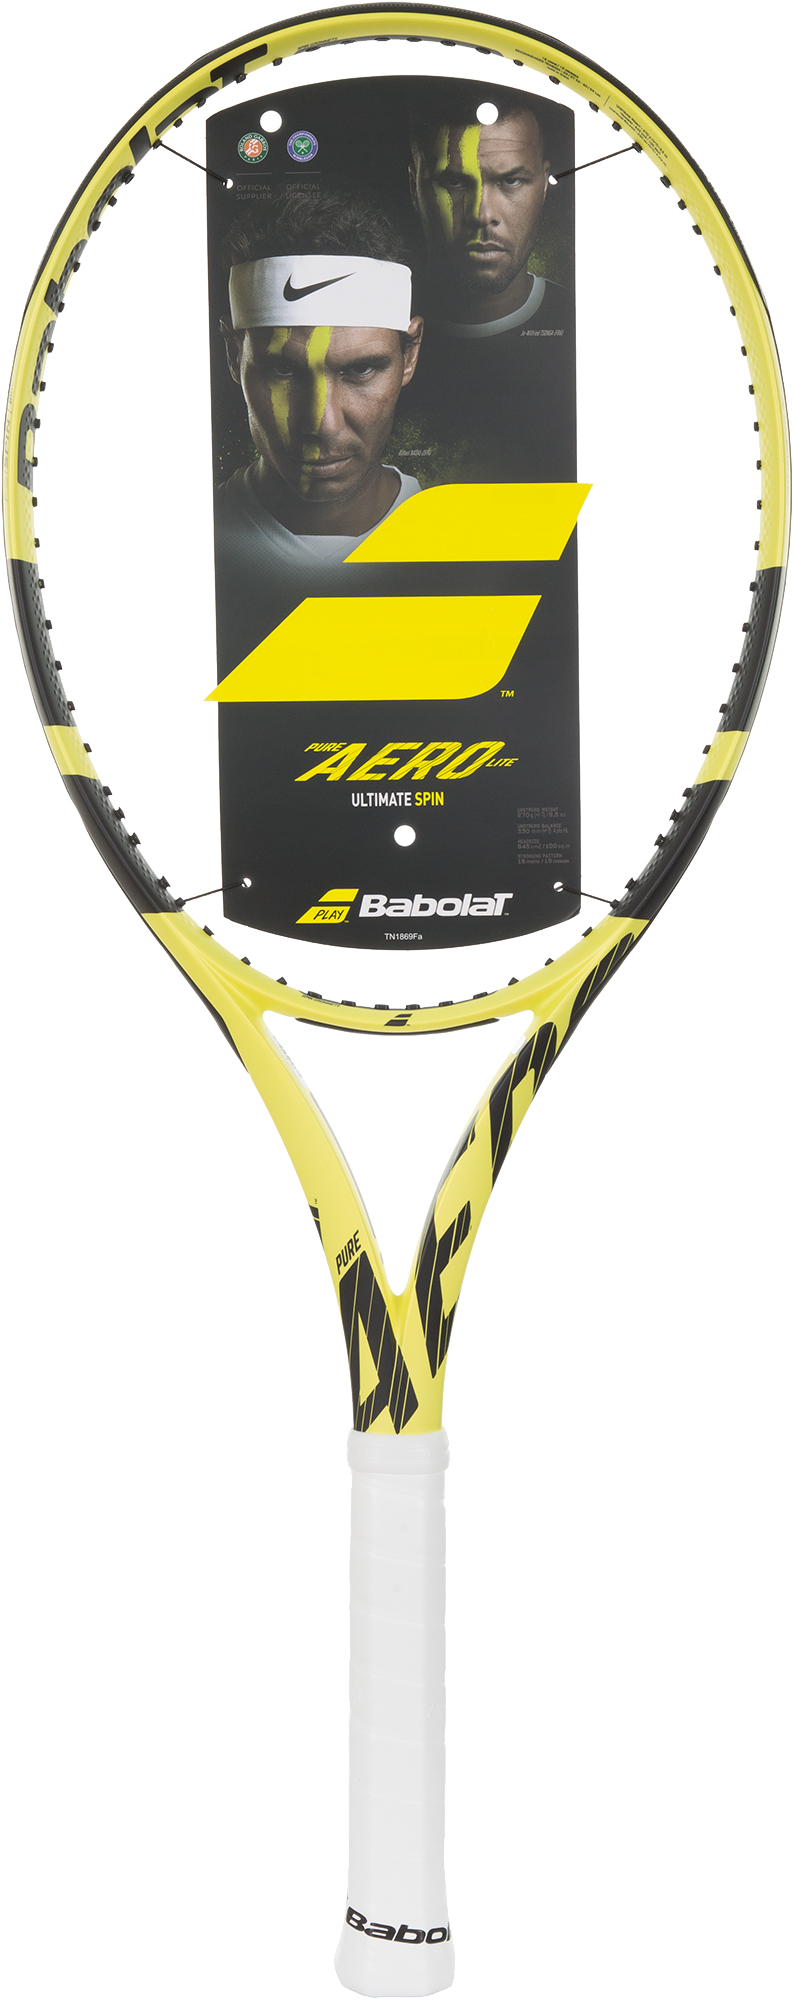 Babolat Ракетка для большого тенниса Babolat Pure Aero Lite babolat набор мячей для большого тенниса babolat orange x3 размер без размера